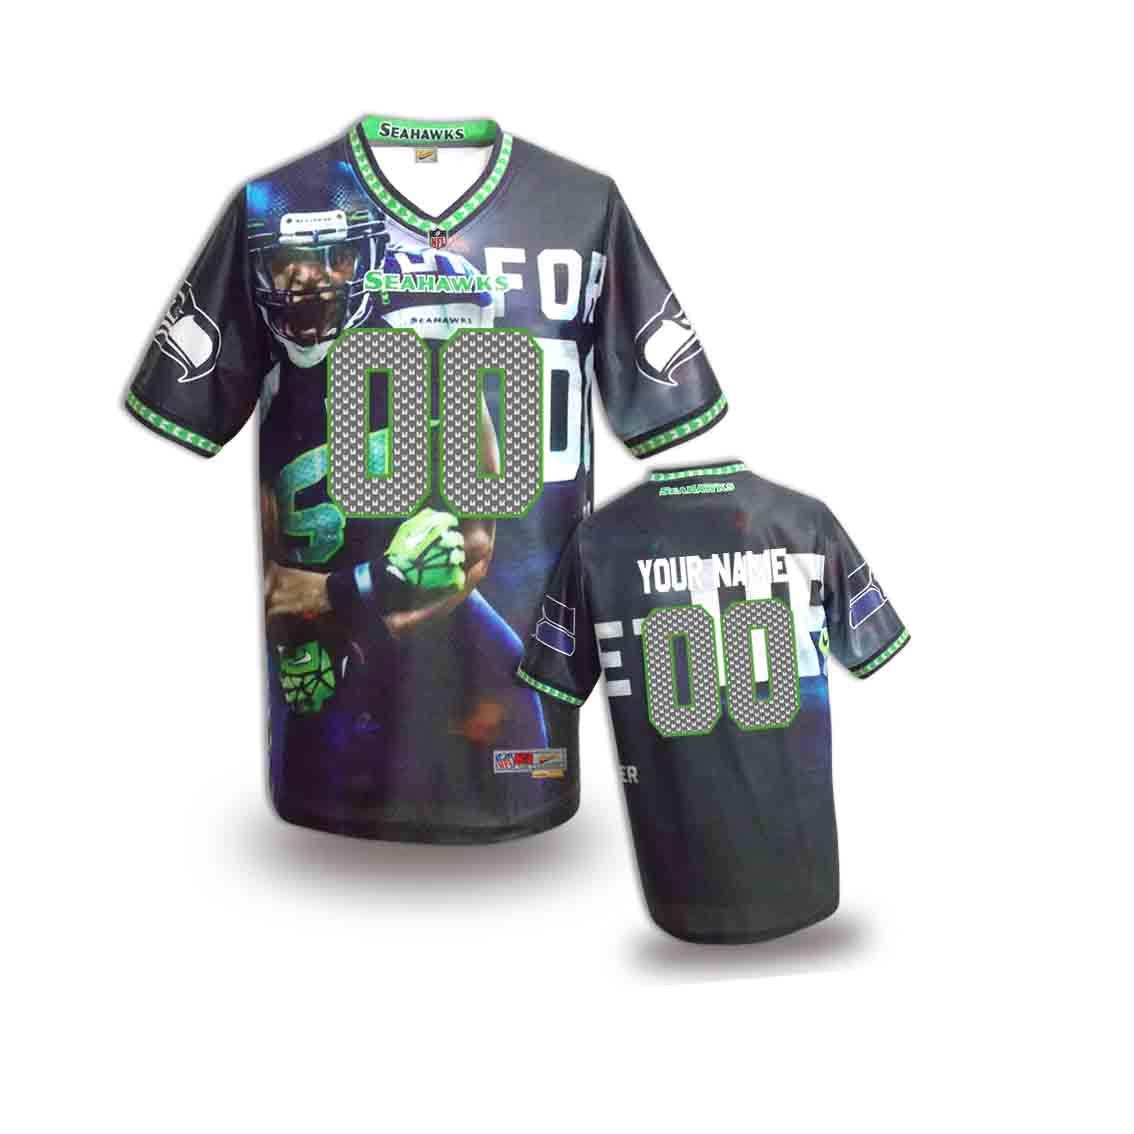 Nike Seahawks Customized Fashion Stitched Youth Jerseys08